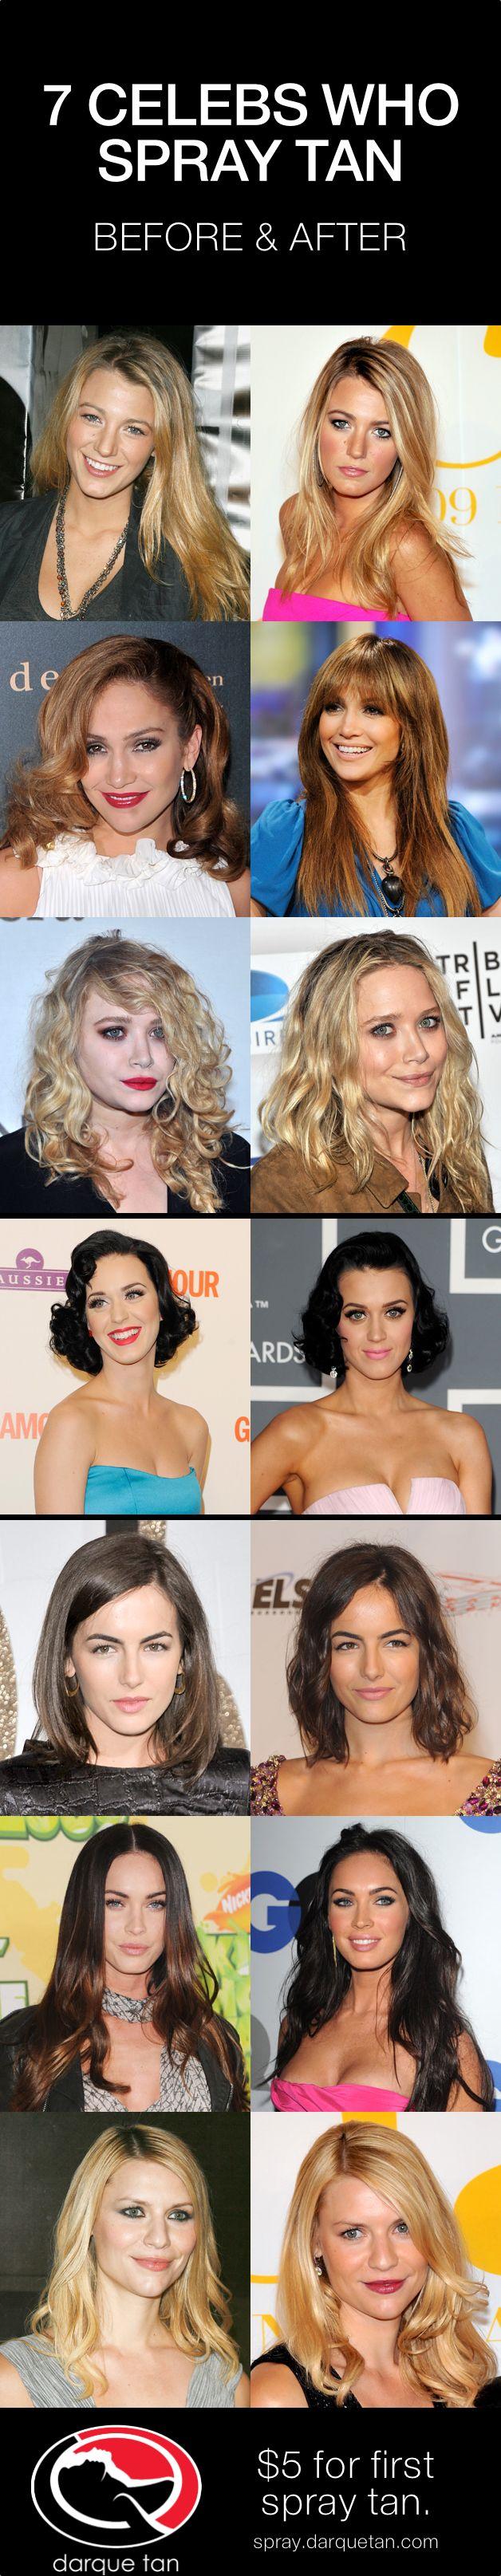 7 celebs who spray tan. #mystictan #spraytan #darquetan